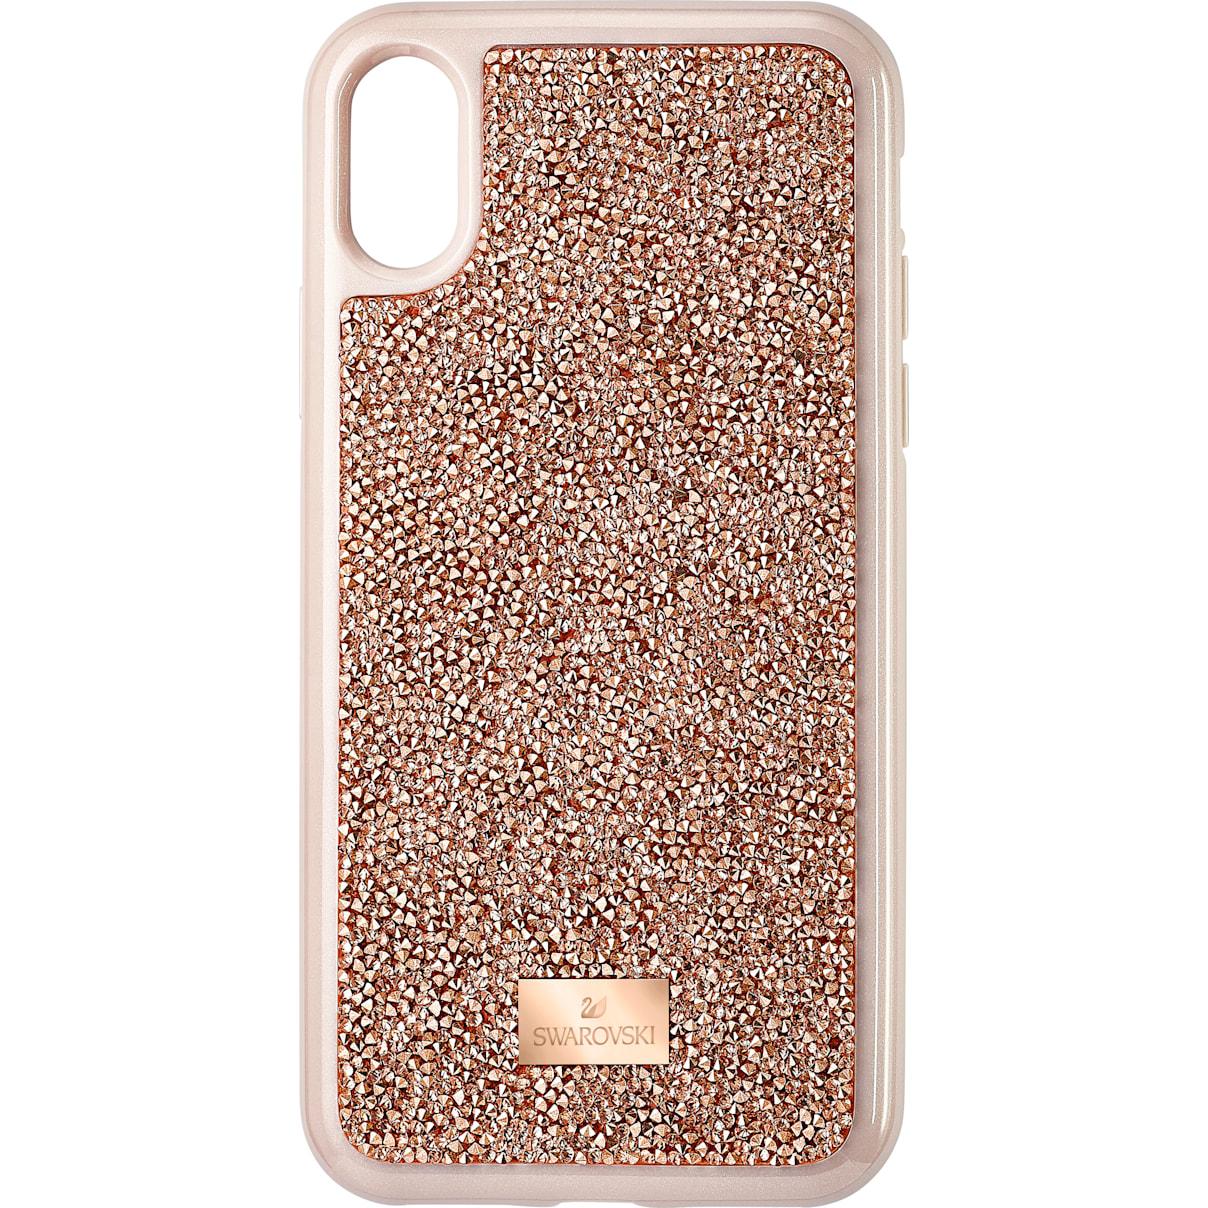 Swarovski Glam Rock Smartphone Case, iPhone® X/XS, Pink Gold